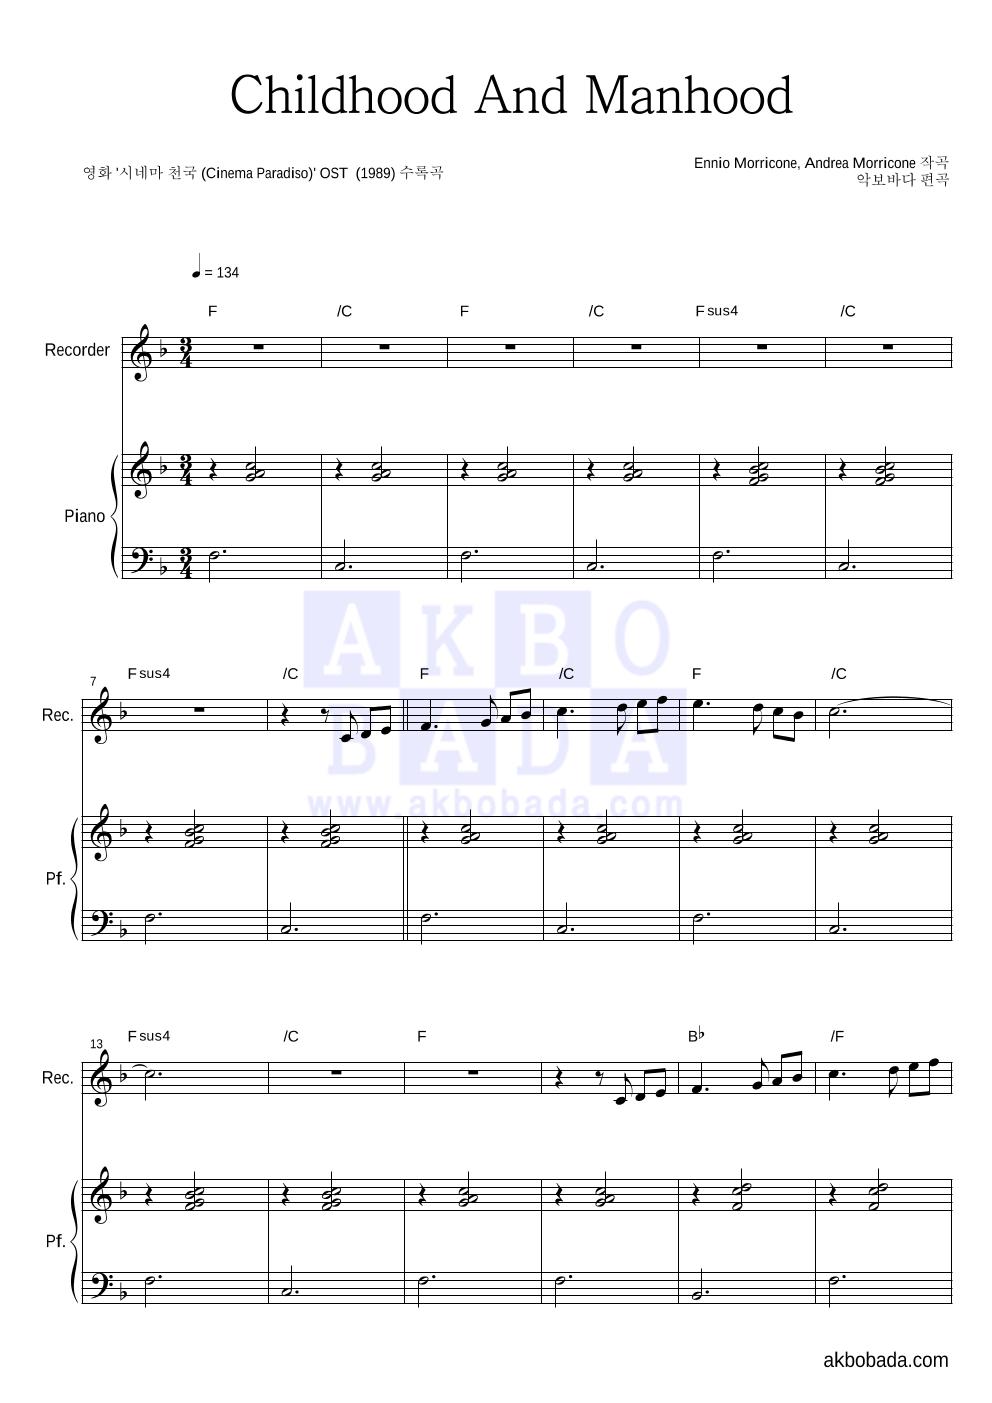 Ennio Morricone - Childhood And Manhood  악보